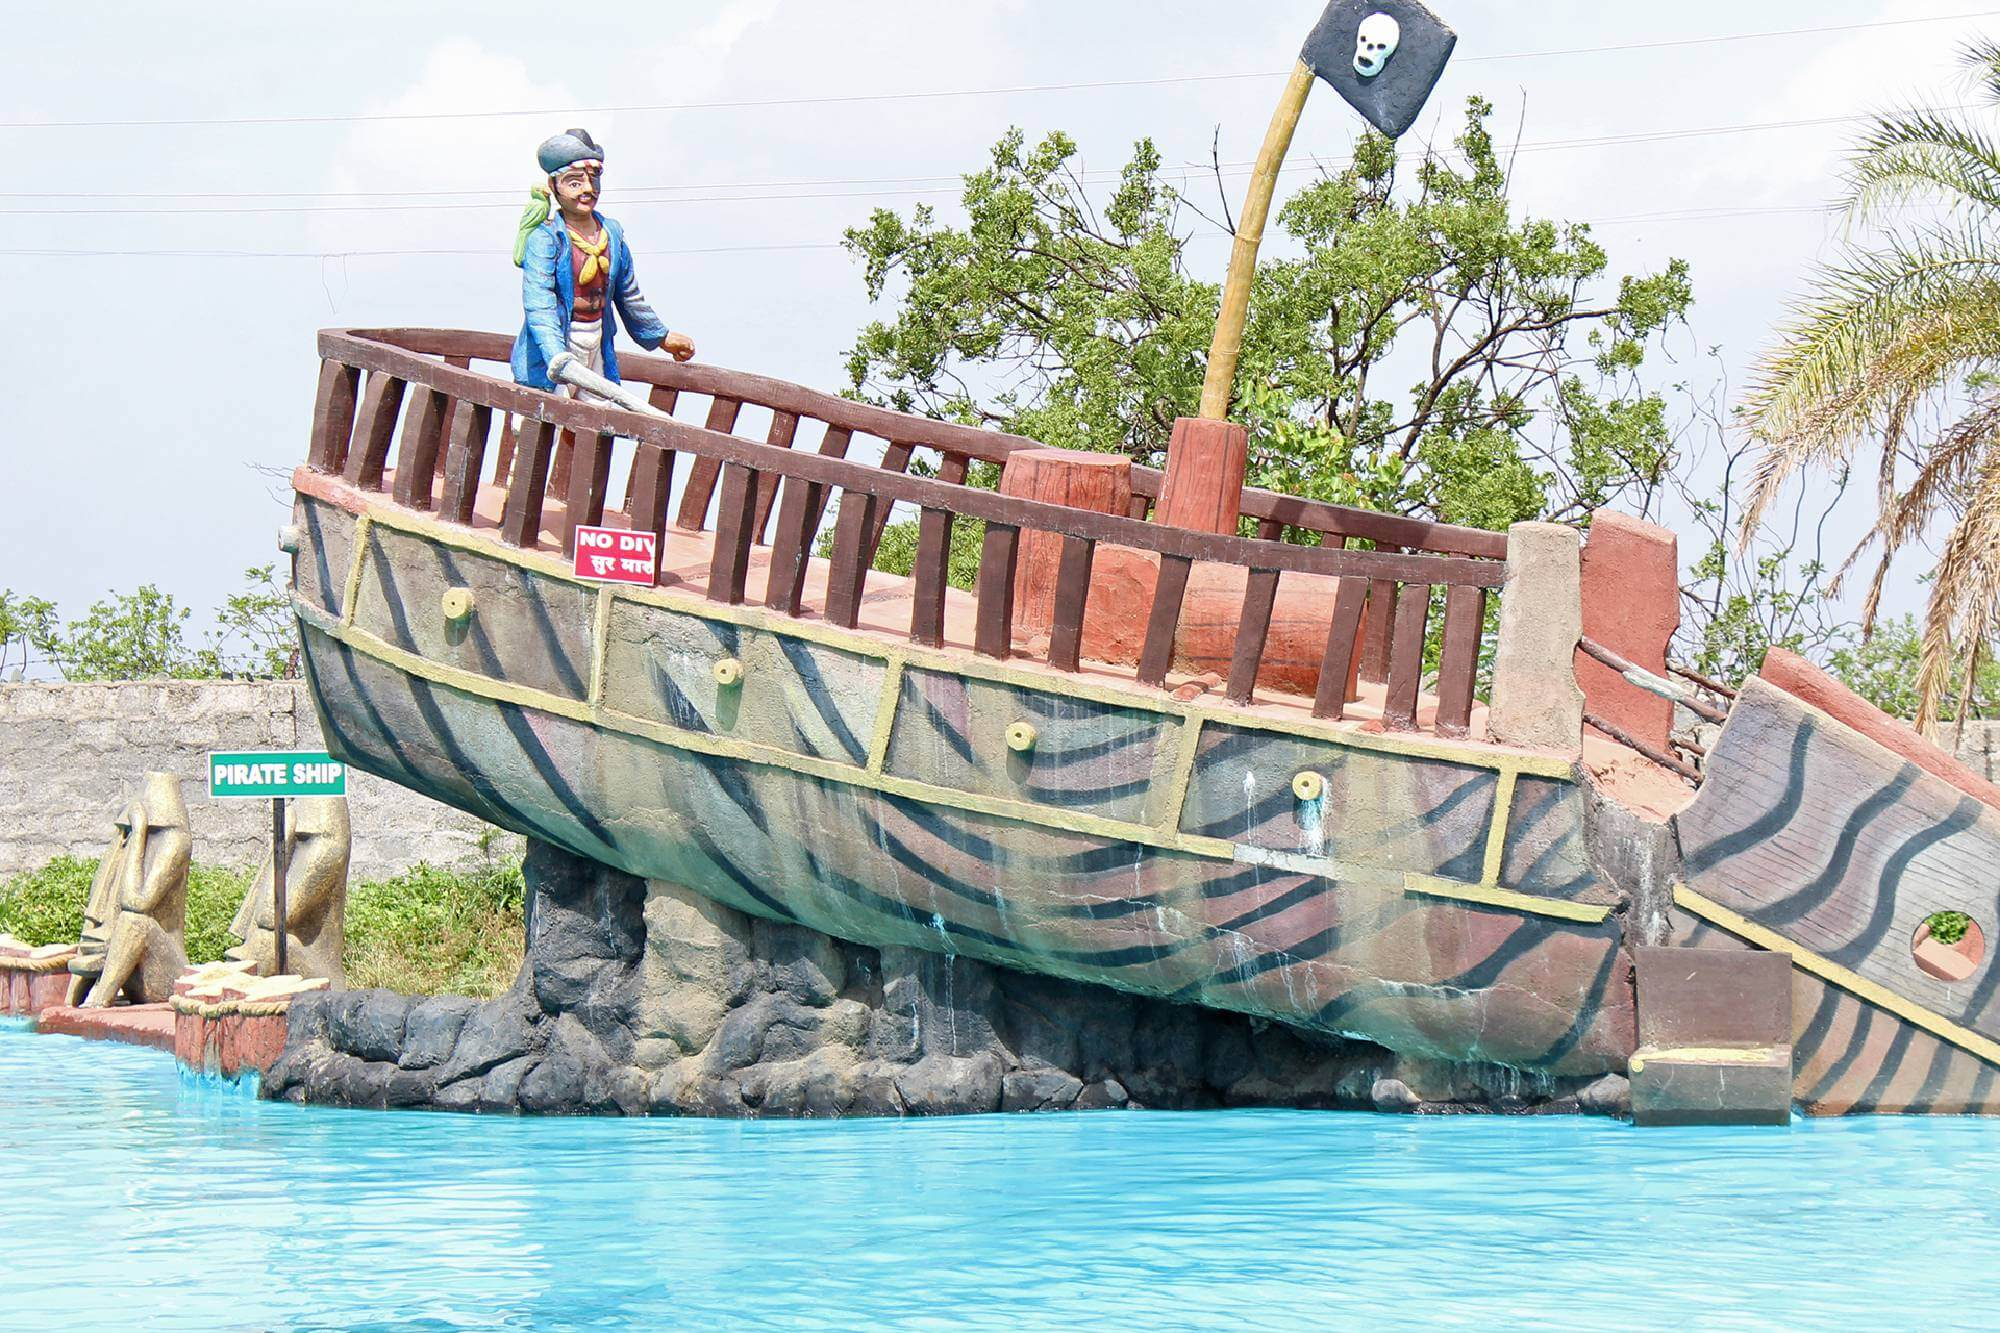 Diamond Water Park and Adventure Park, Pune